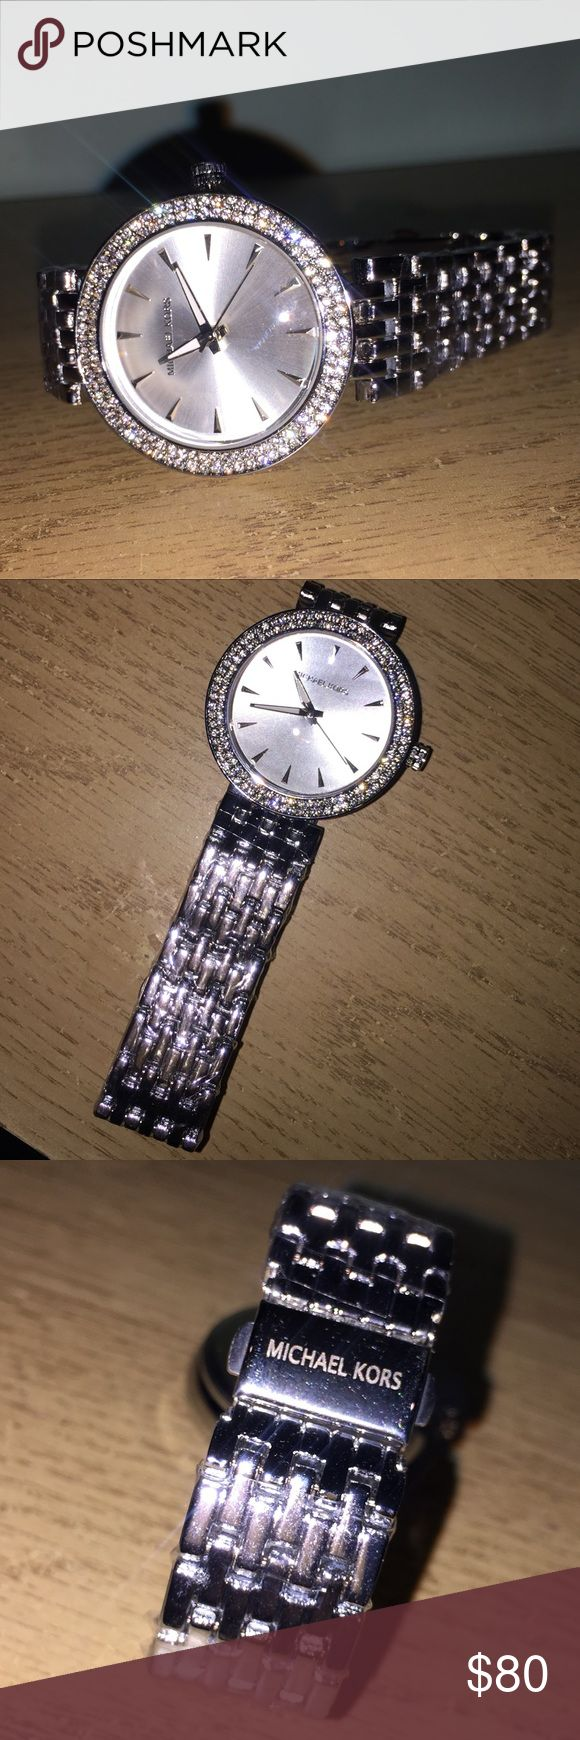 Michael Kors watch Silver Michael Kors watch.   New. Accessories Watches